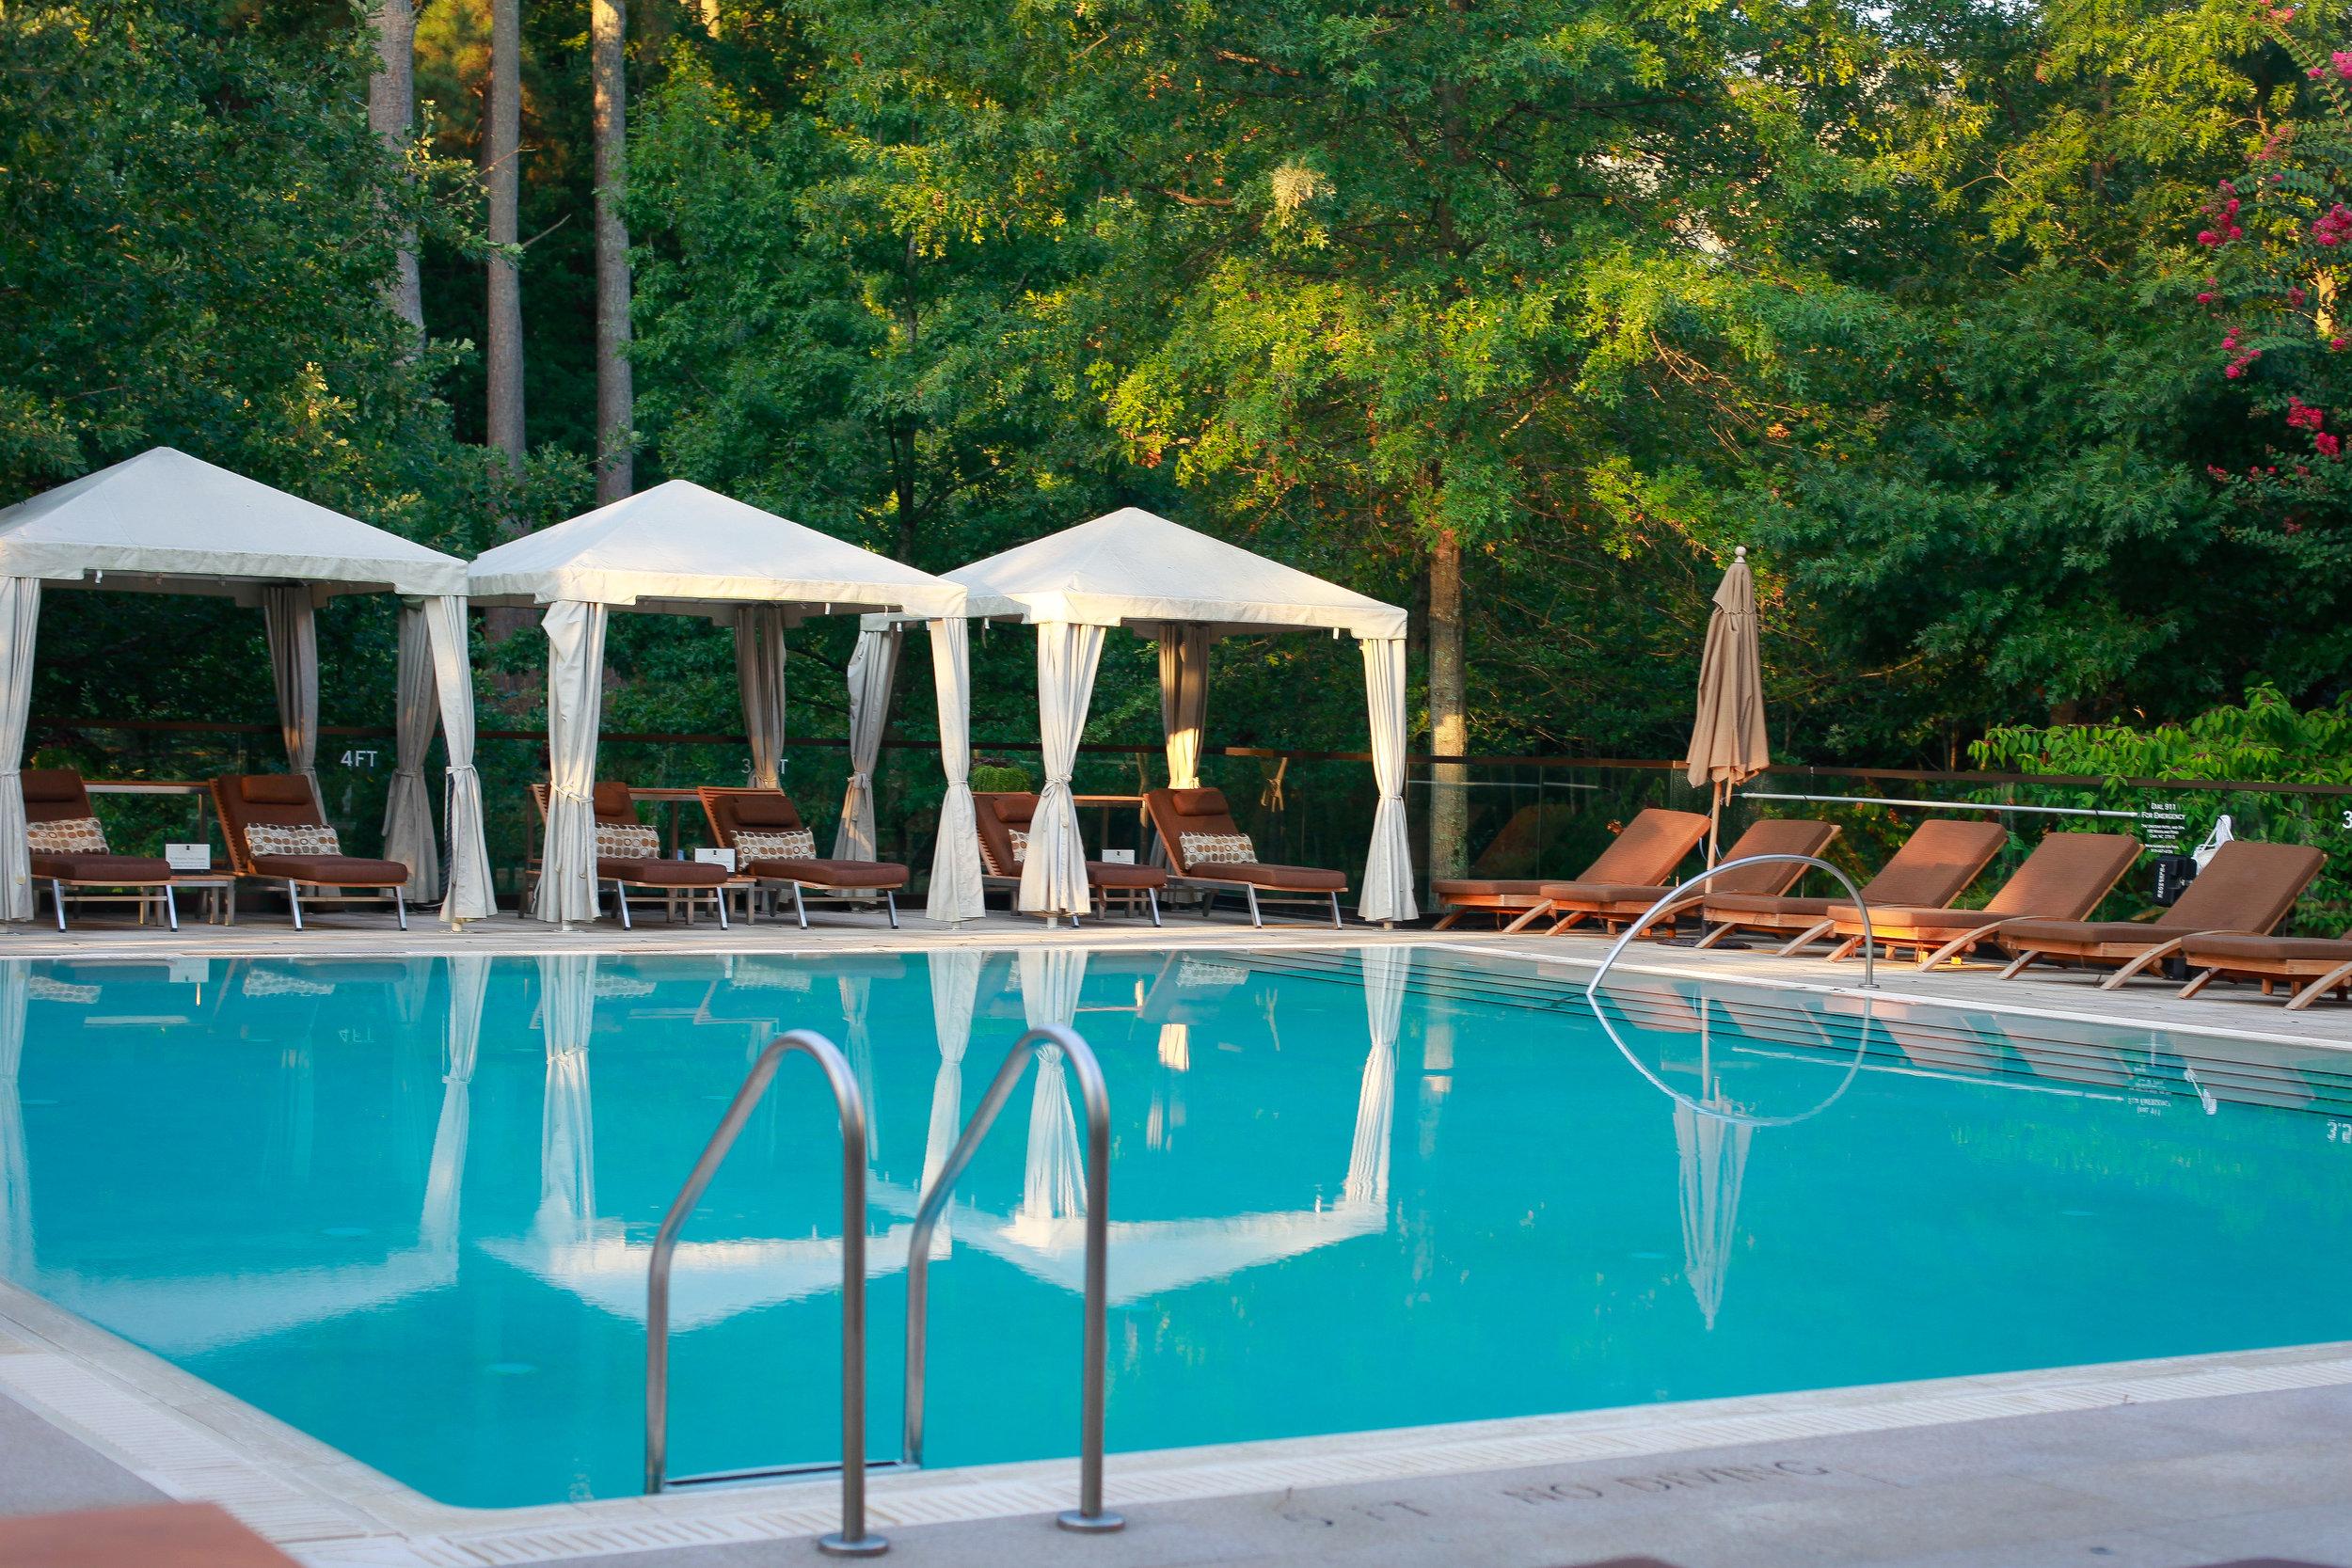 Pool and Cabana.jpg